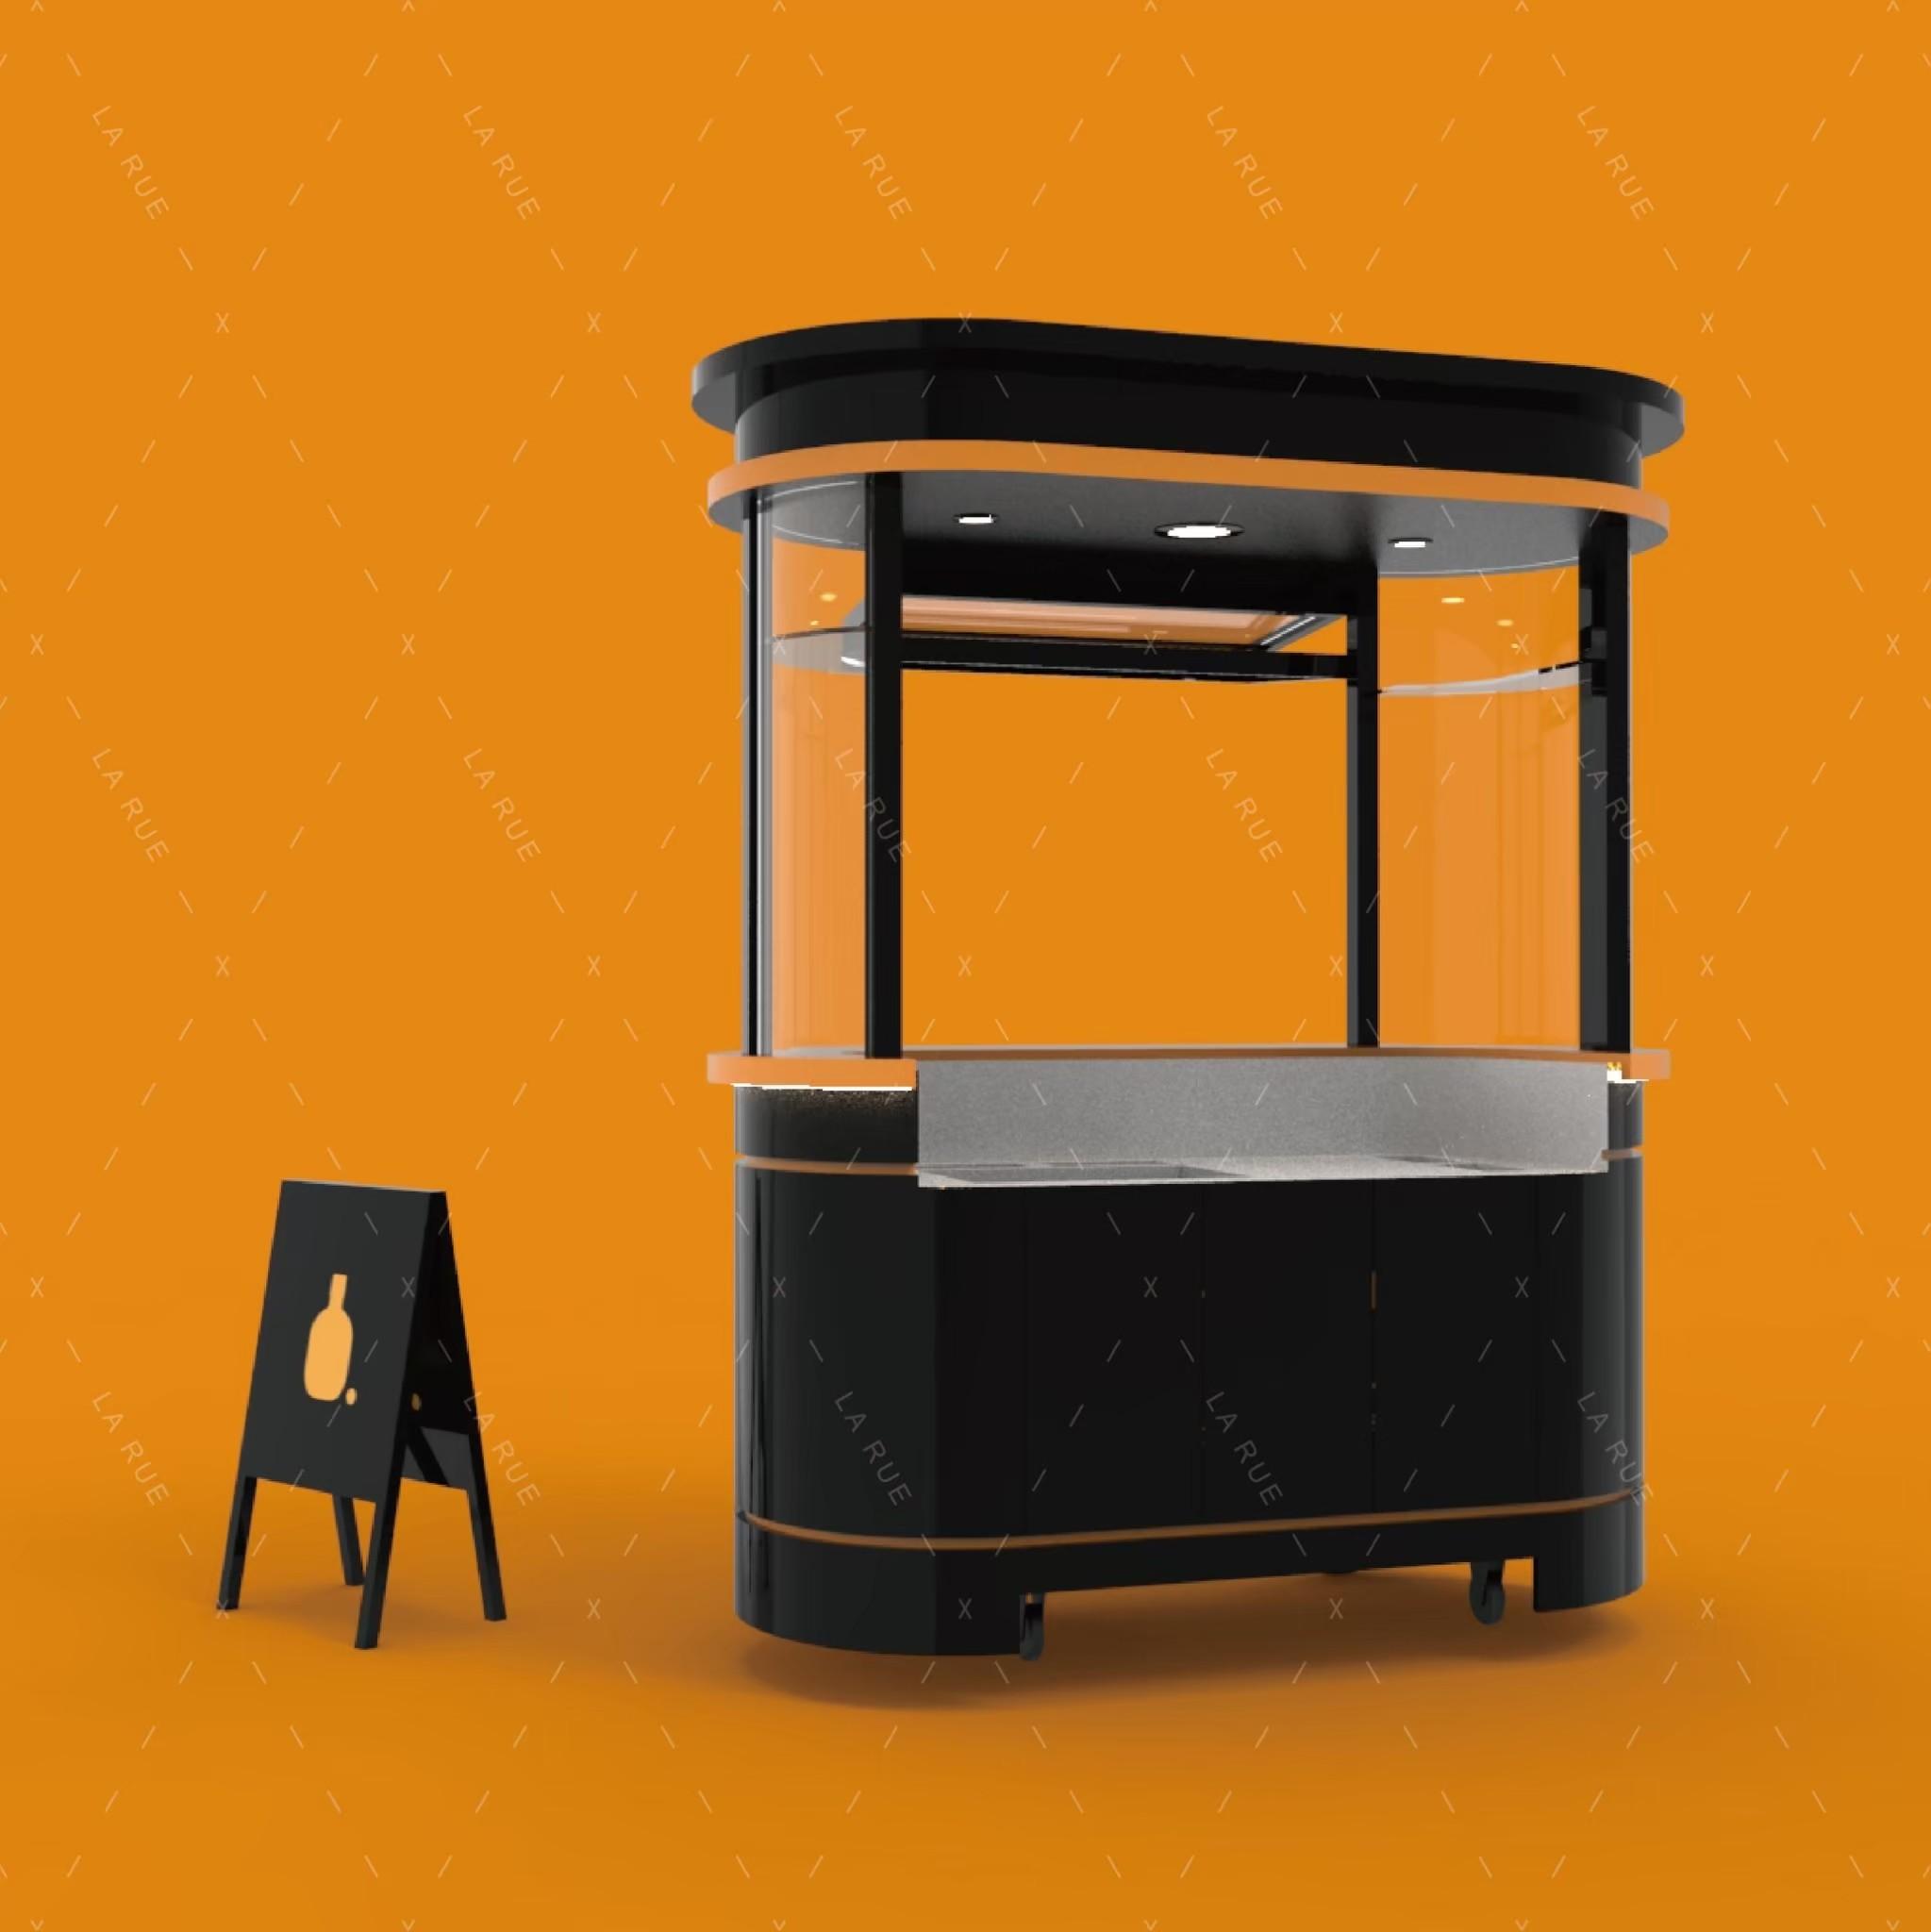 浮水印餐車_210615_0